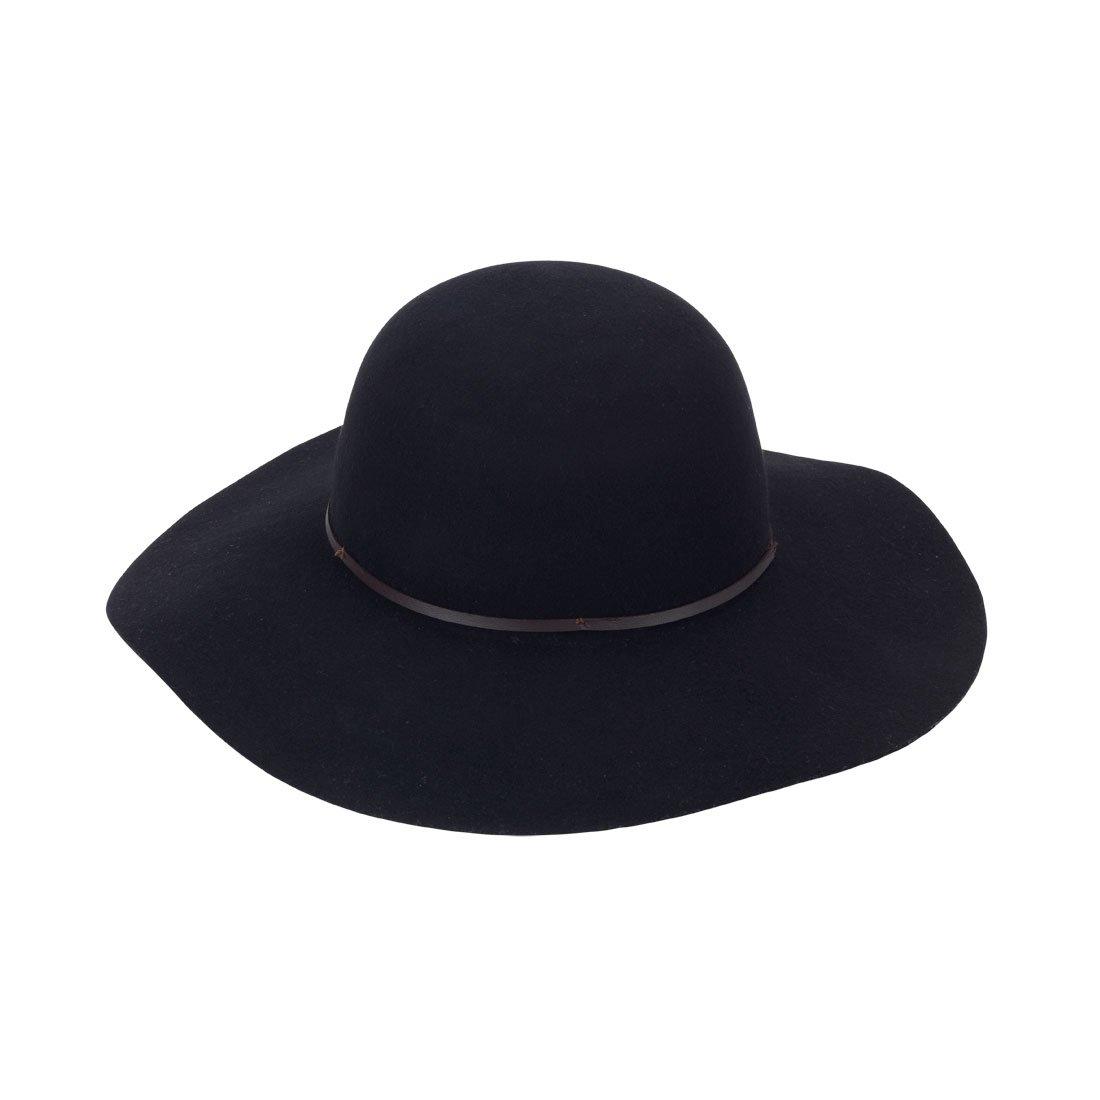 Amazon.com  Wholesale Boutique Wool Floppy Hat Black  Toys   Games 3a55f3ca355